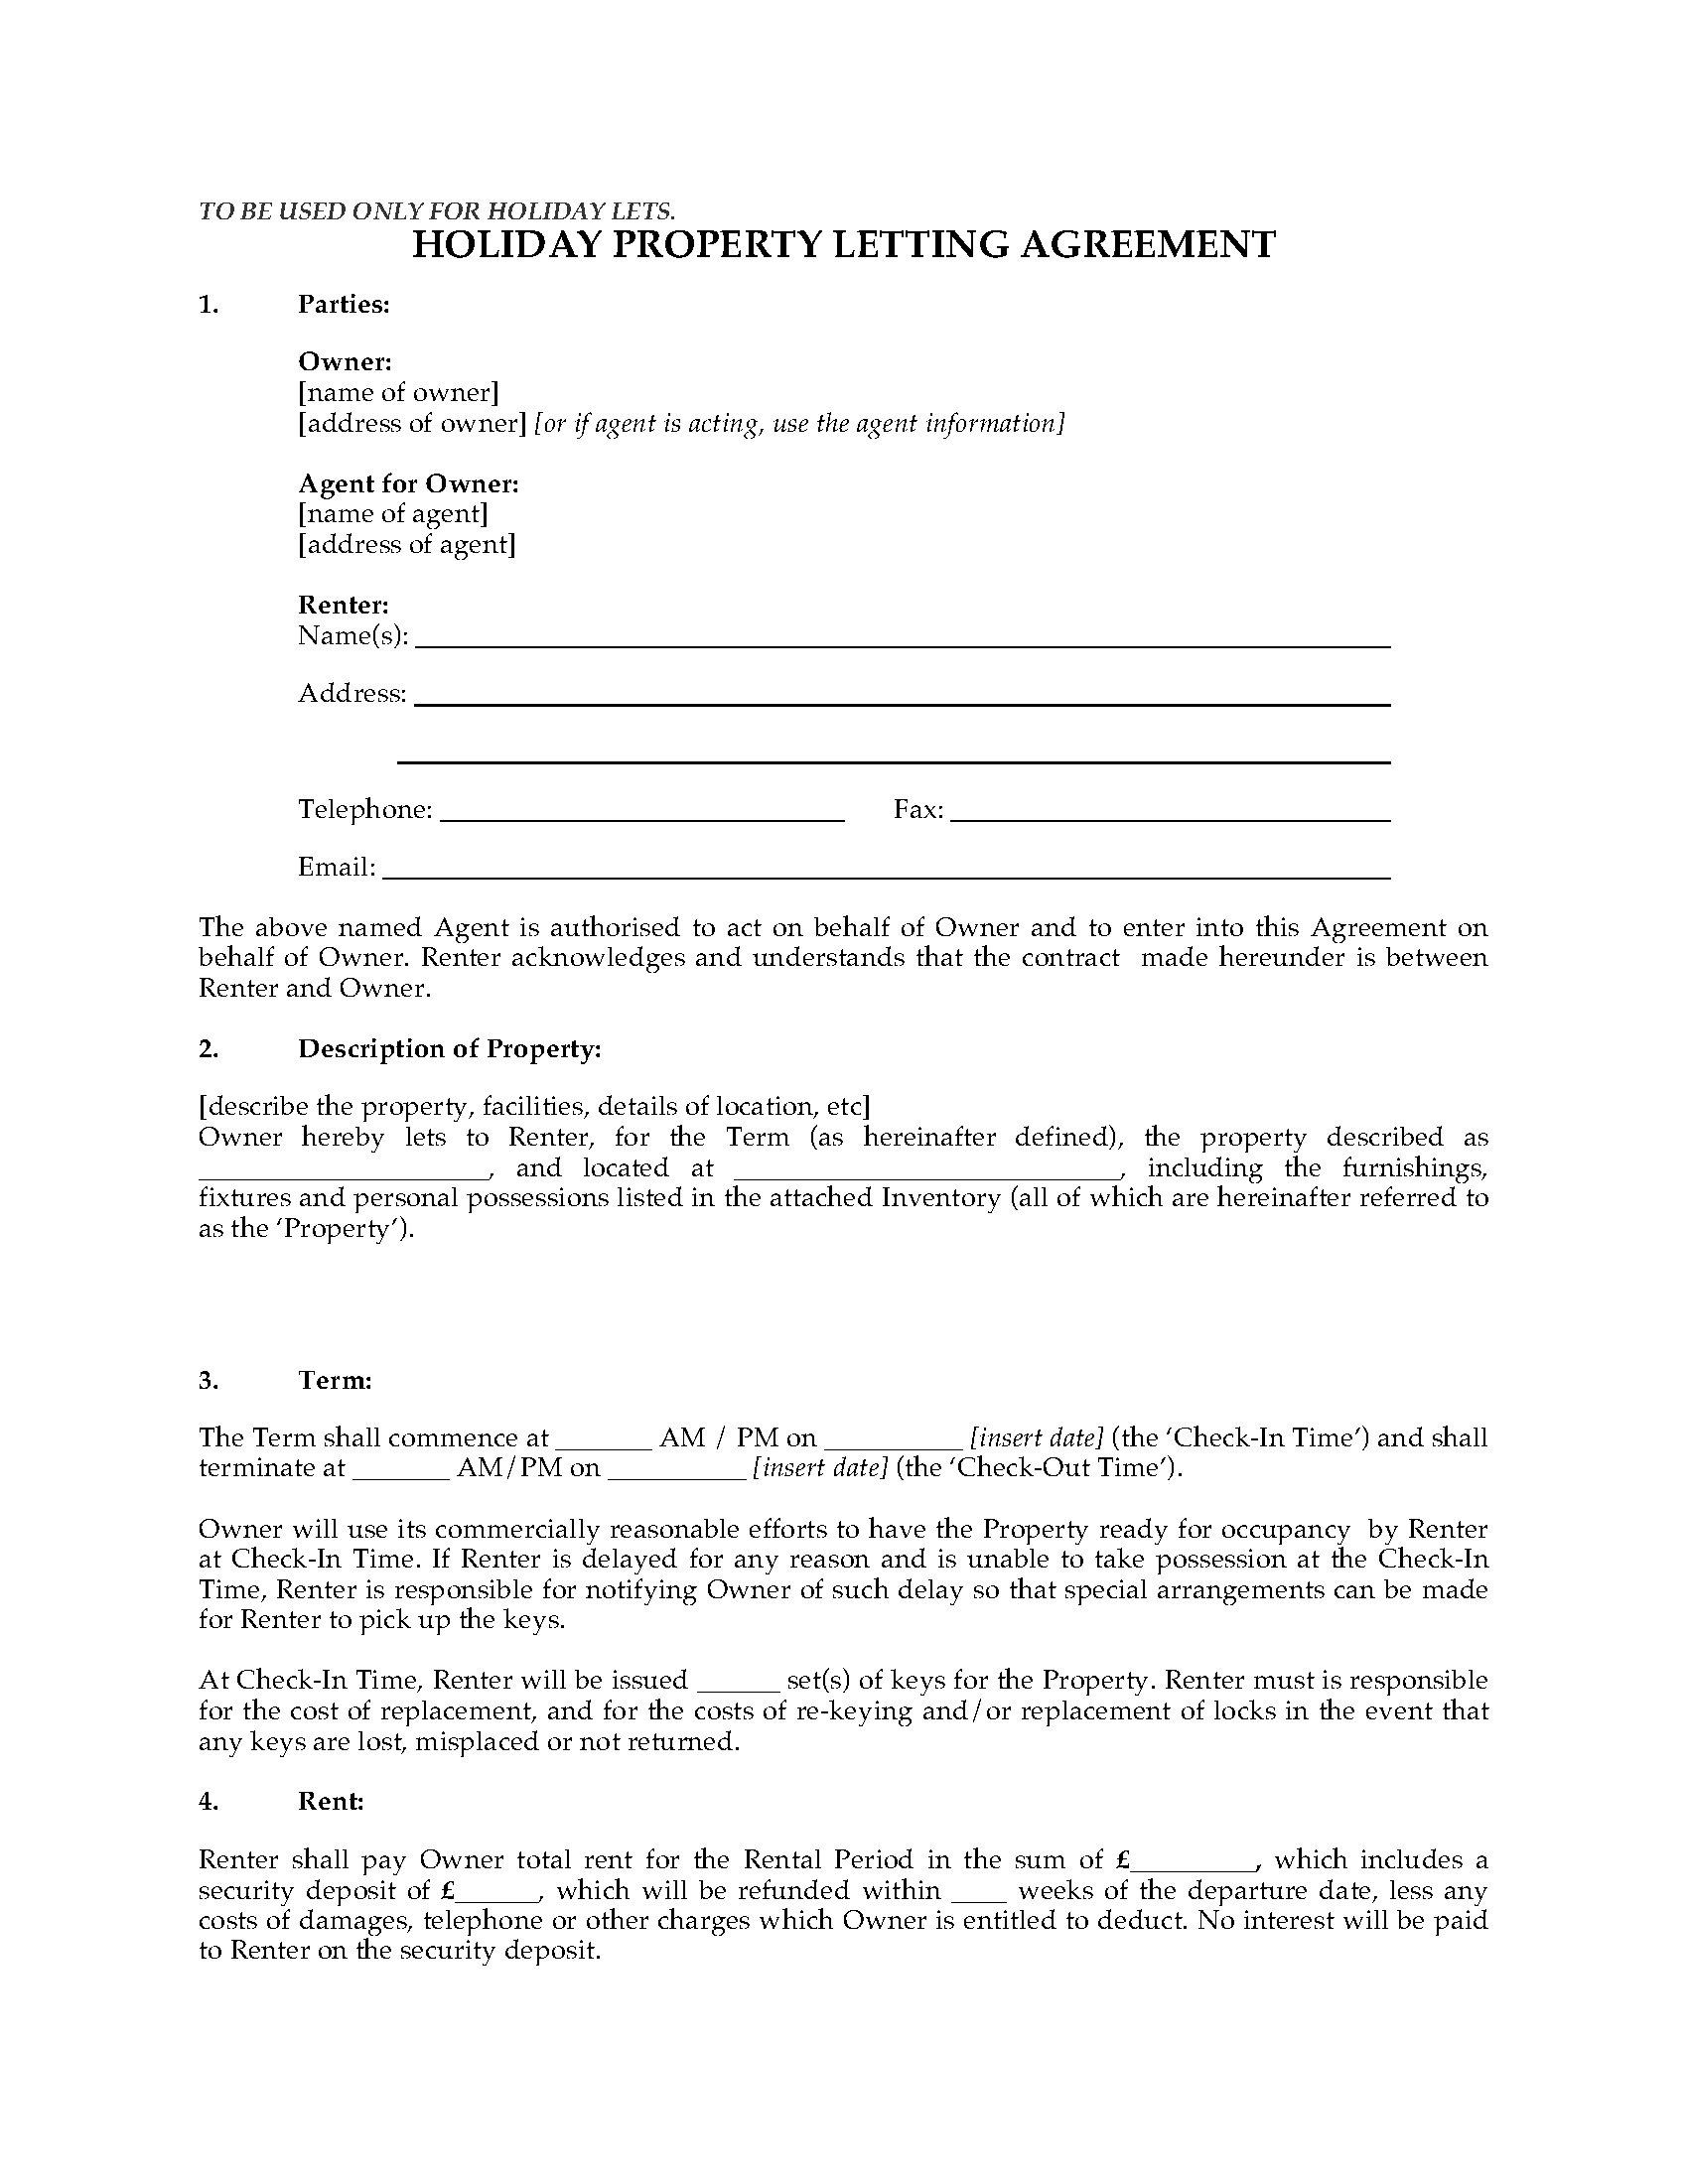 Contents Insurance Rental Property Ireland